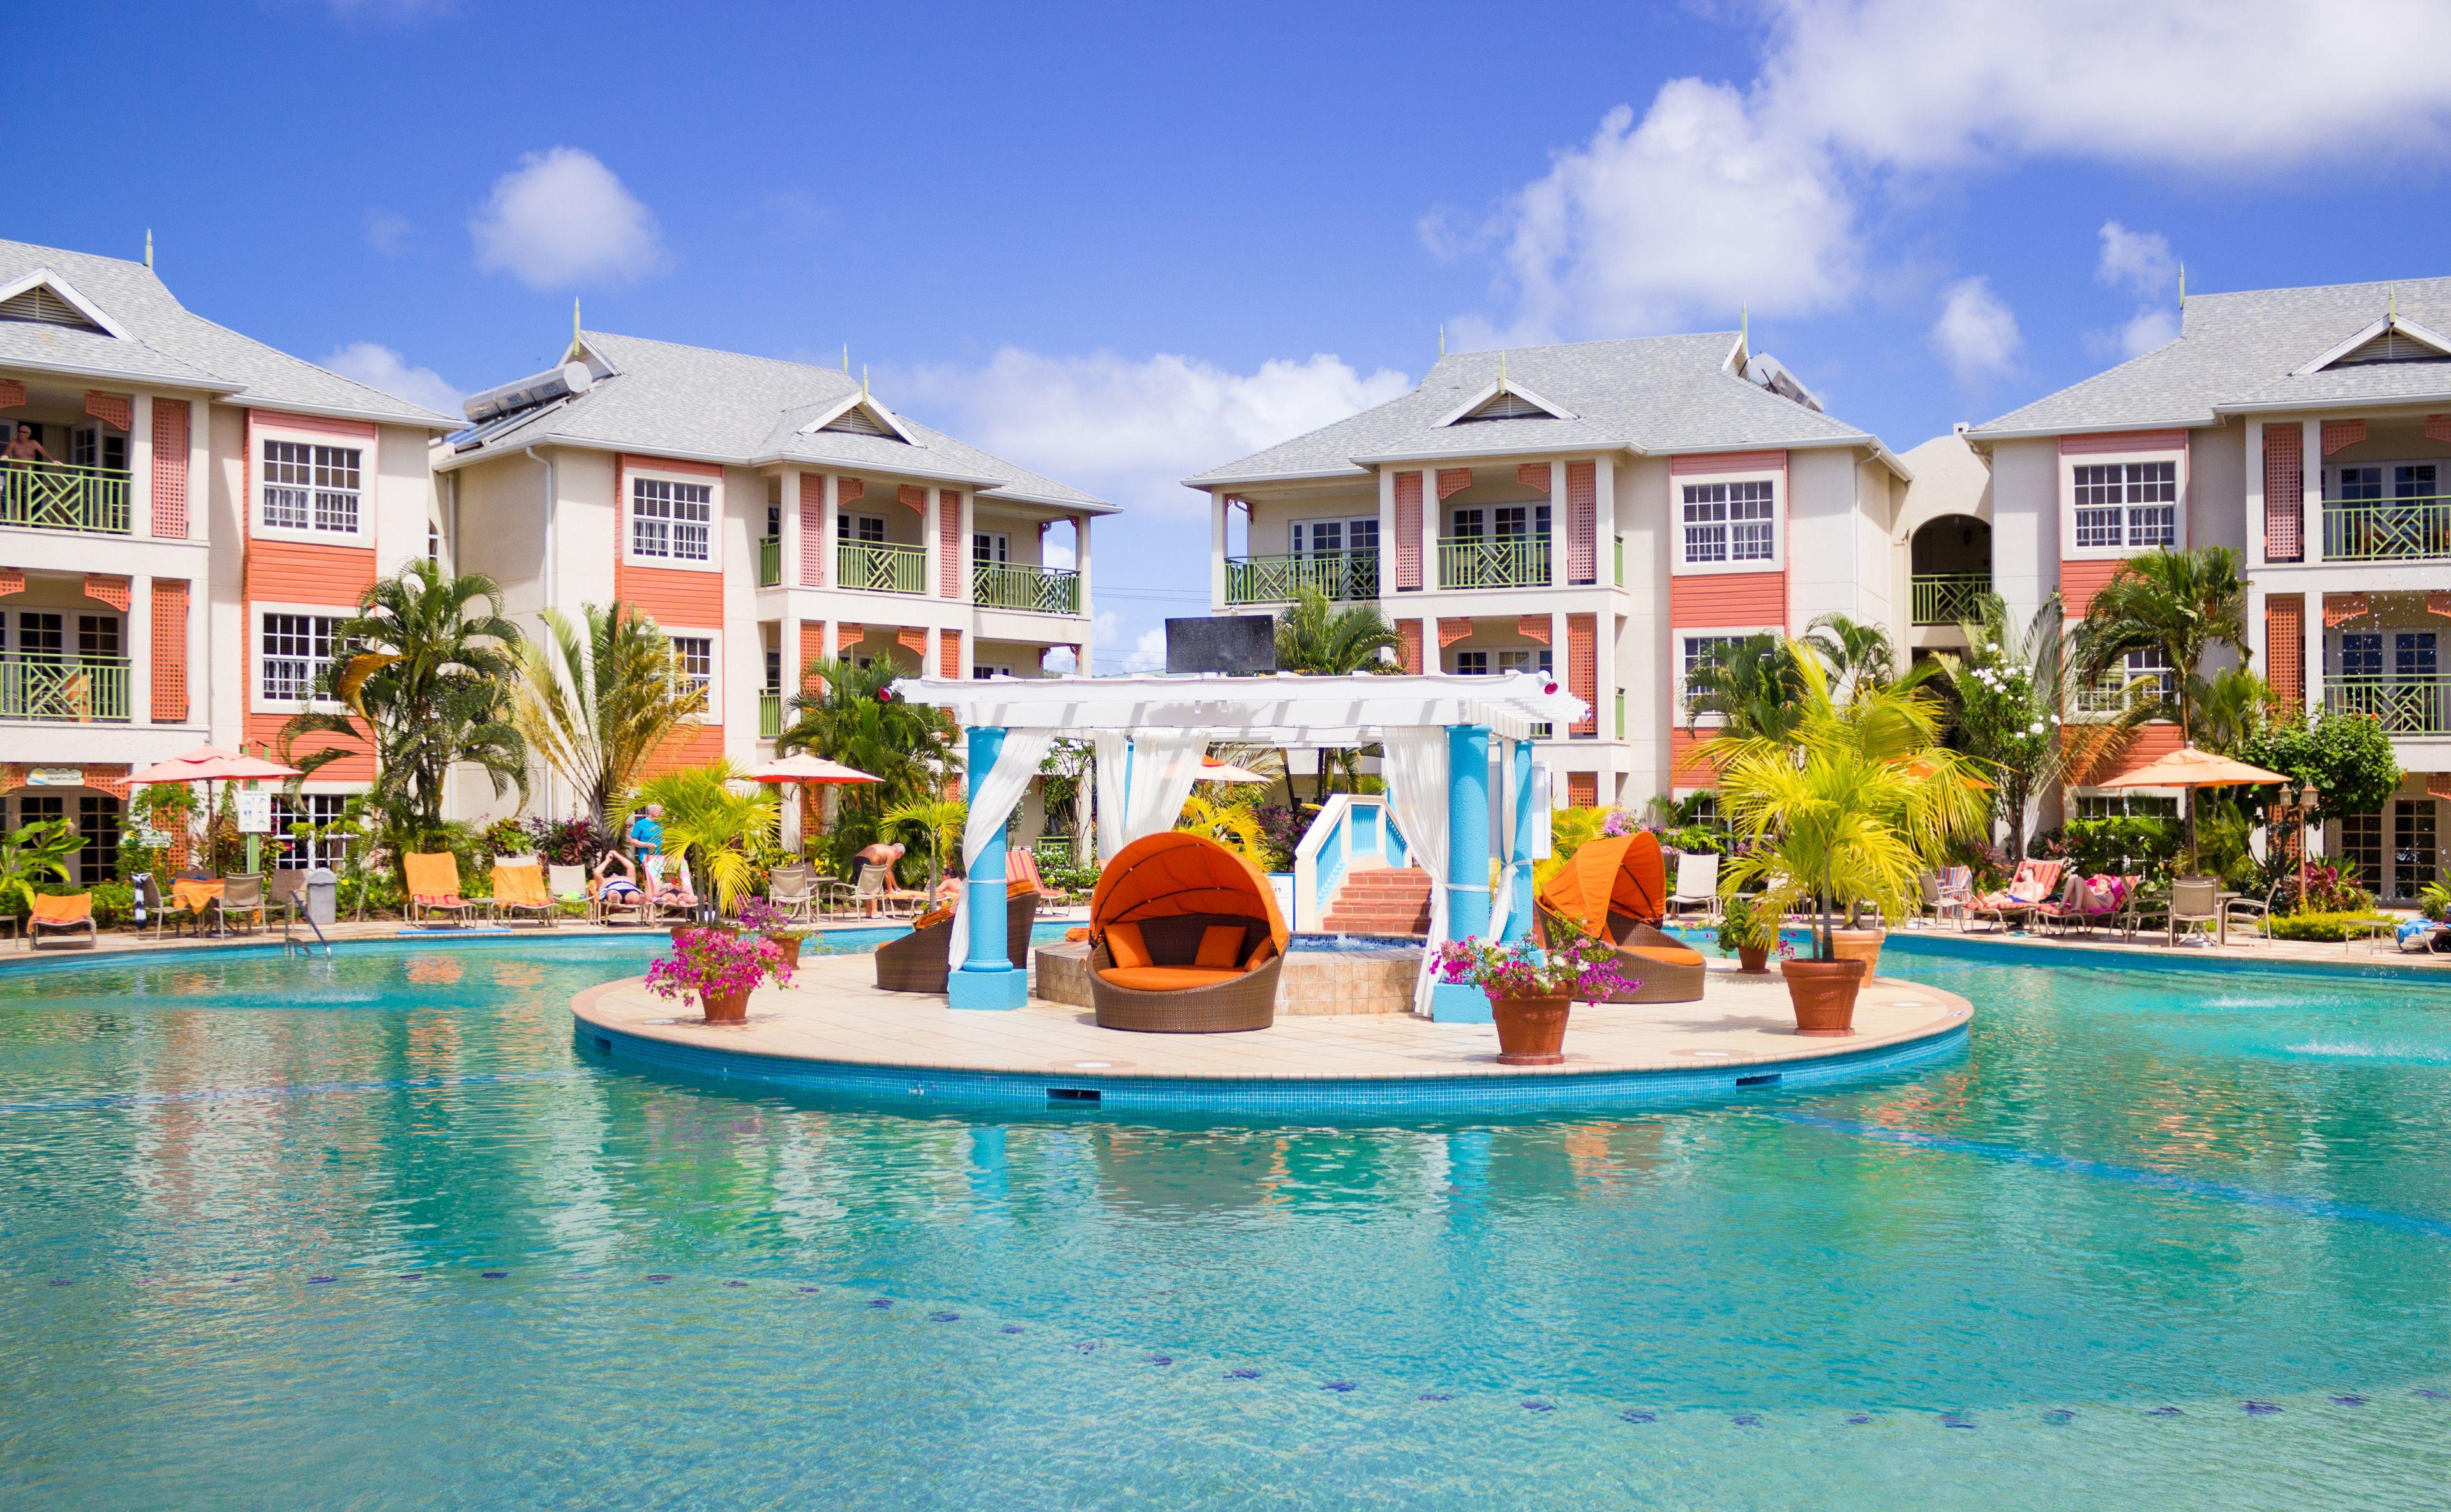 Courtesy of Bay Gardens Beach Resort / Expedia